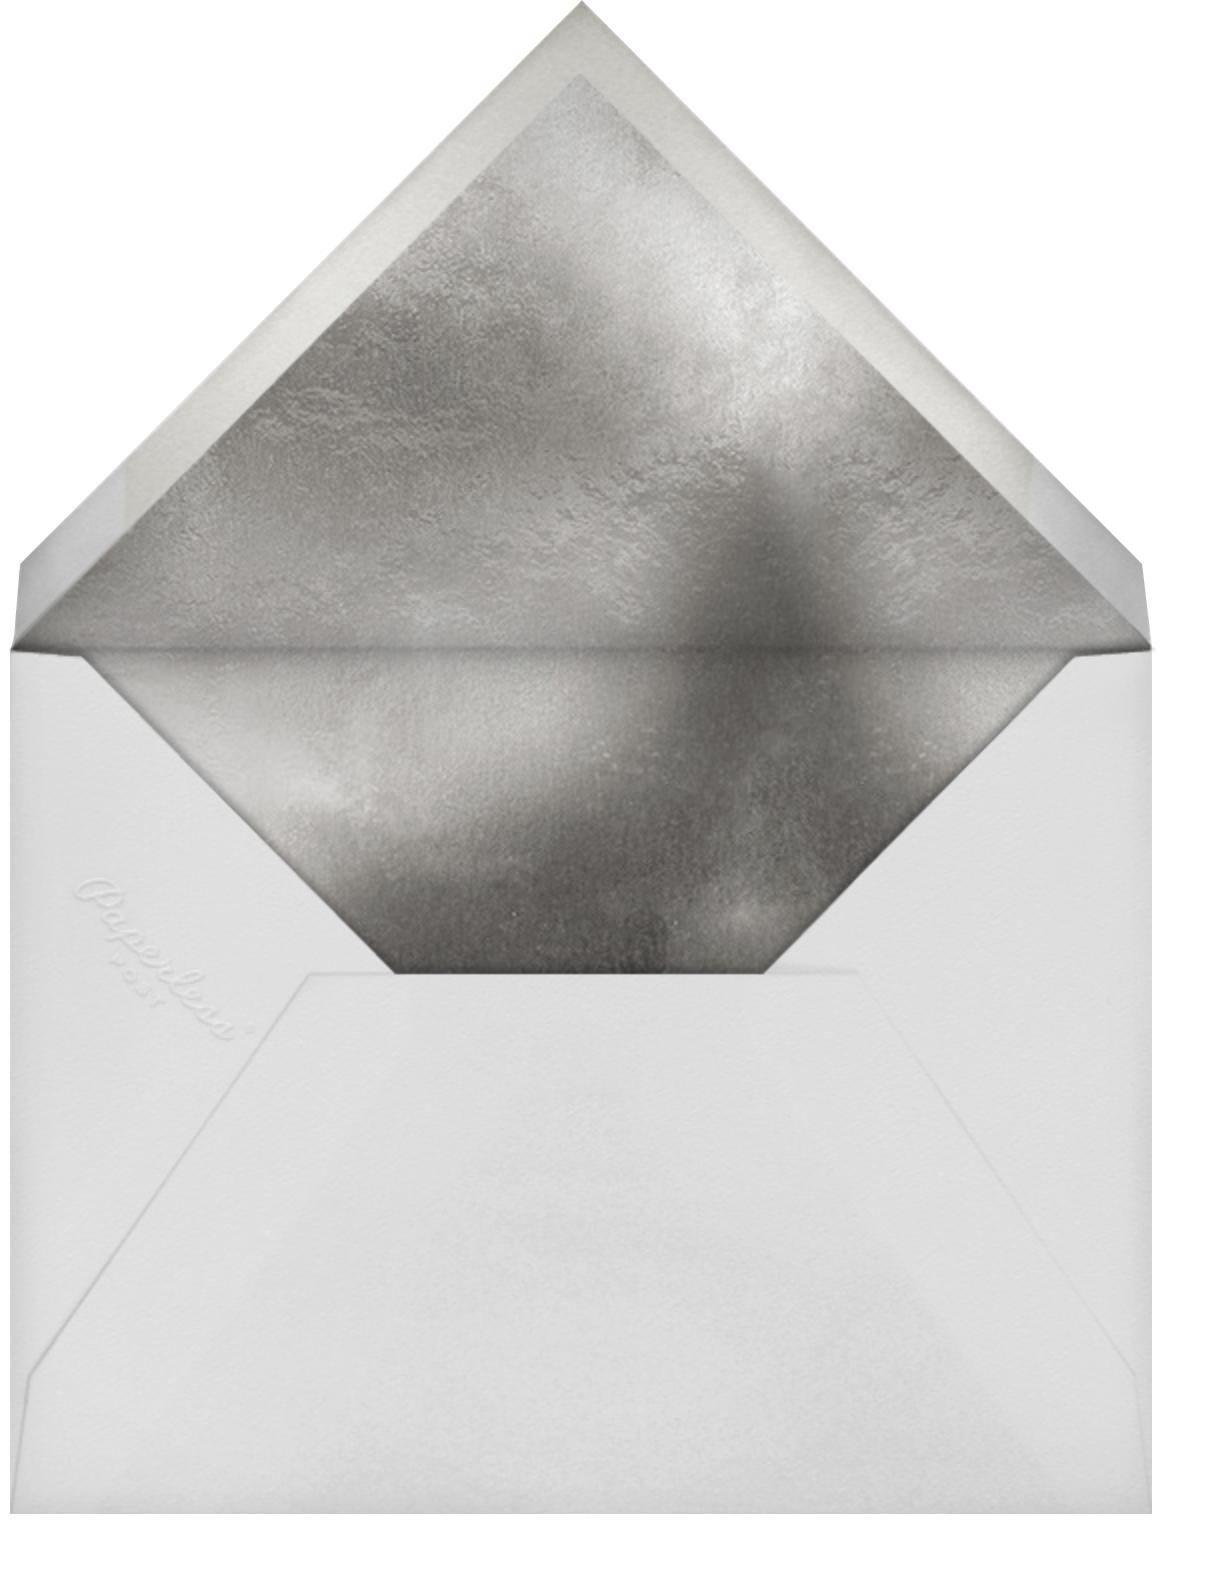 Awry - Kelly Wearstler - Destination - envelope back